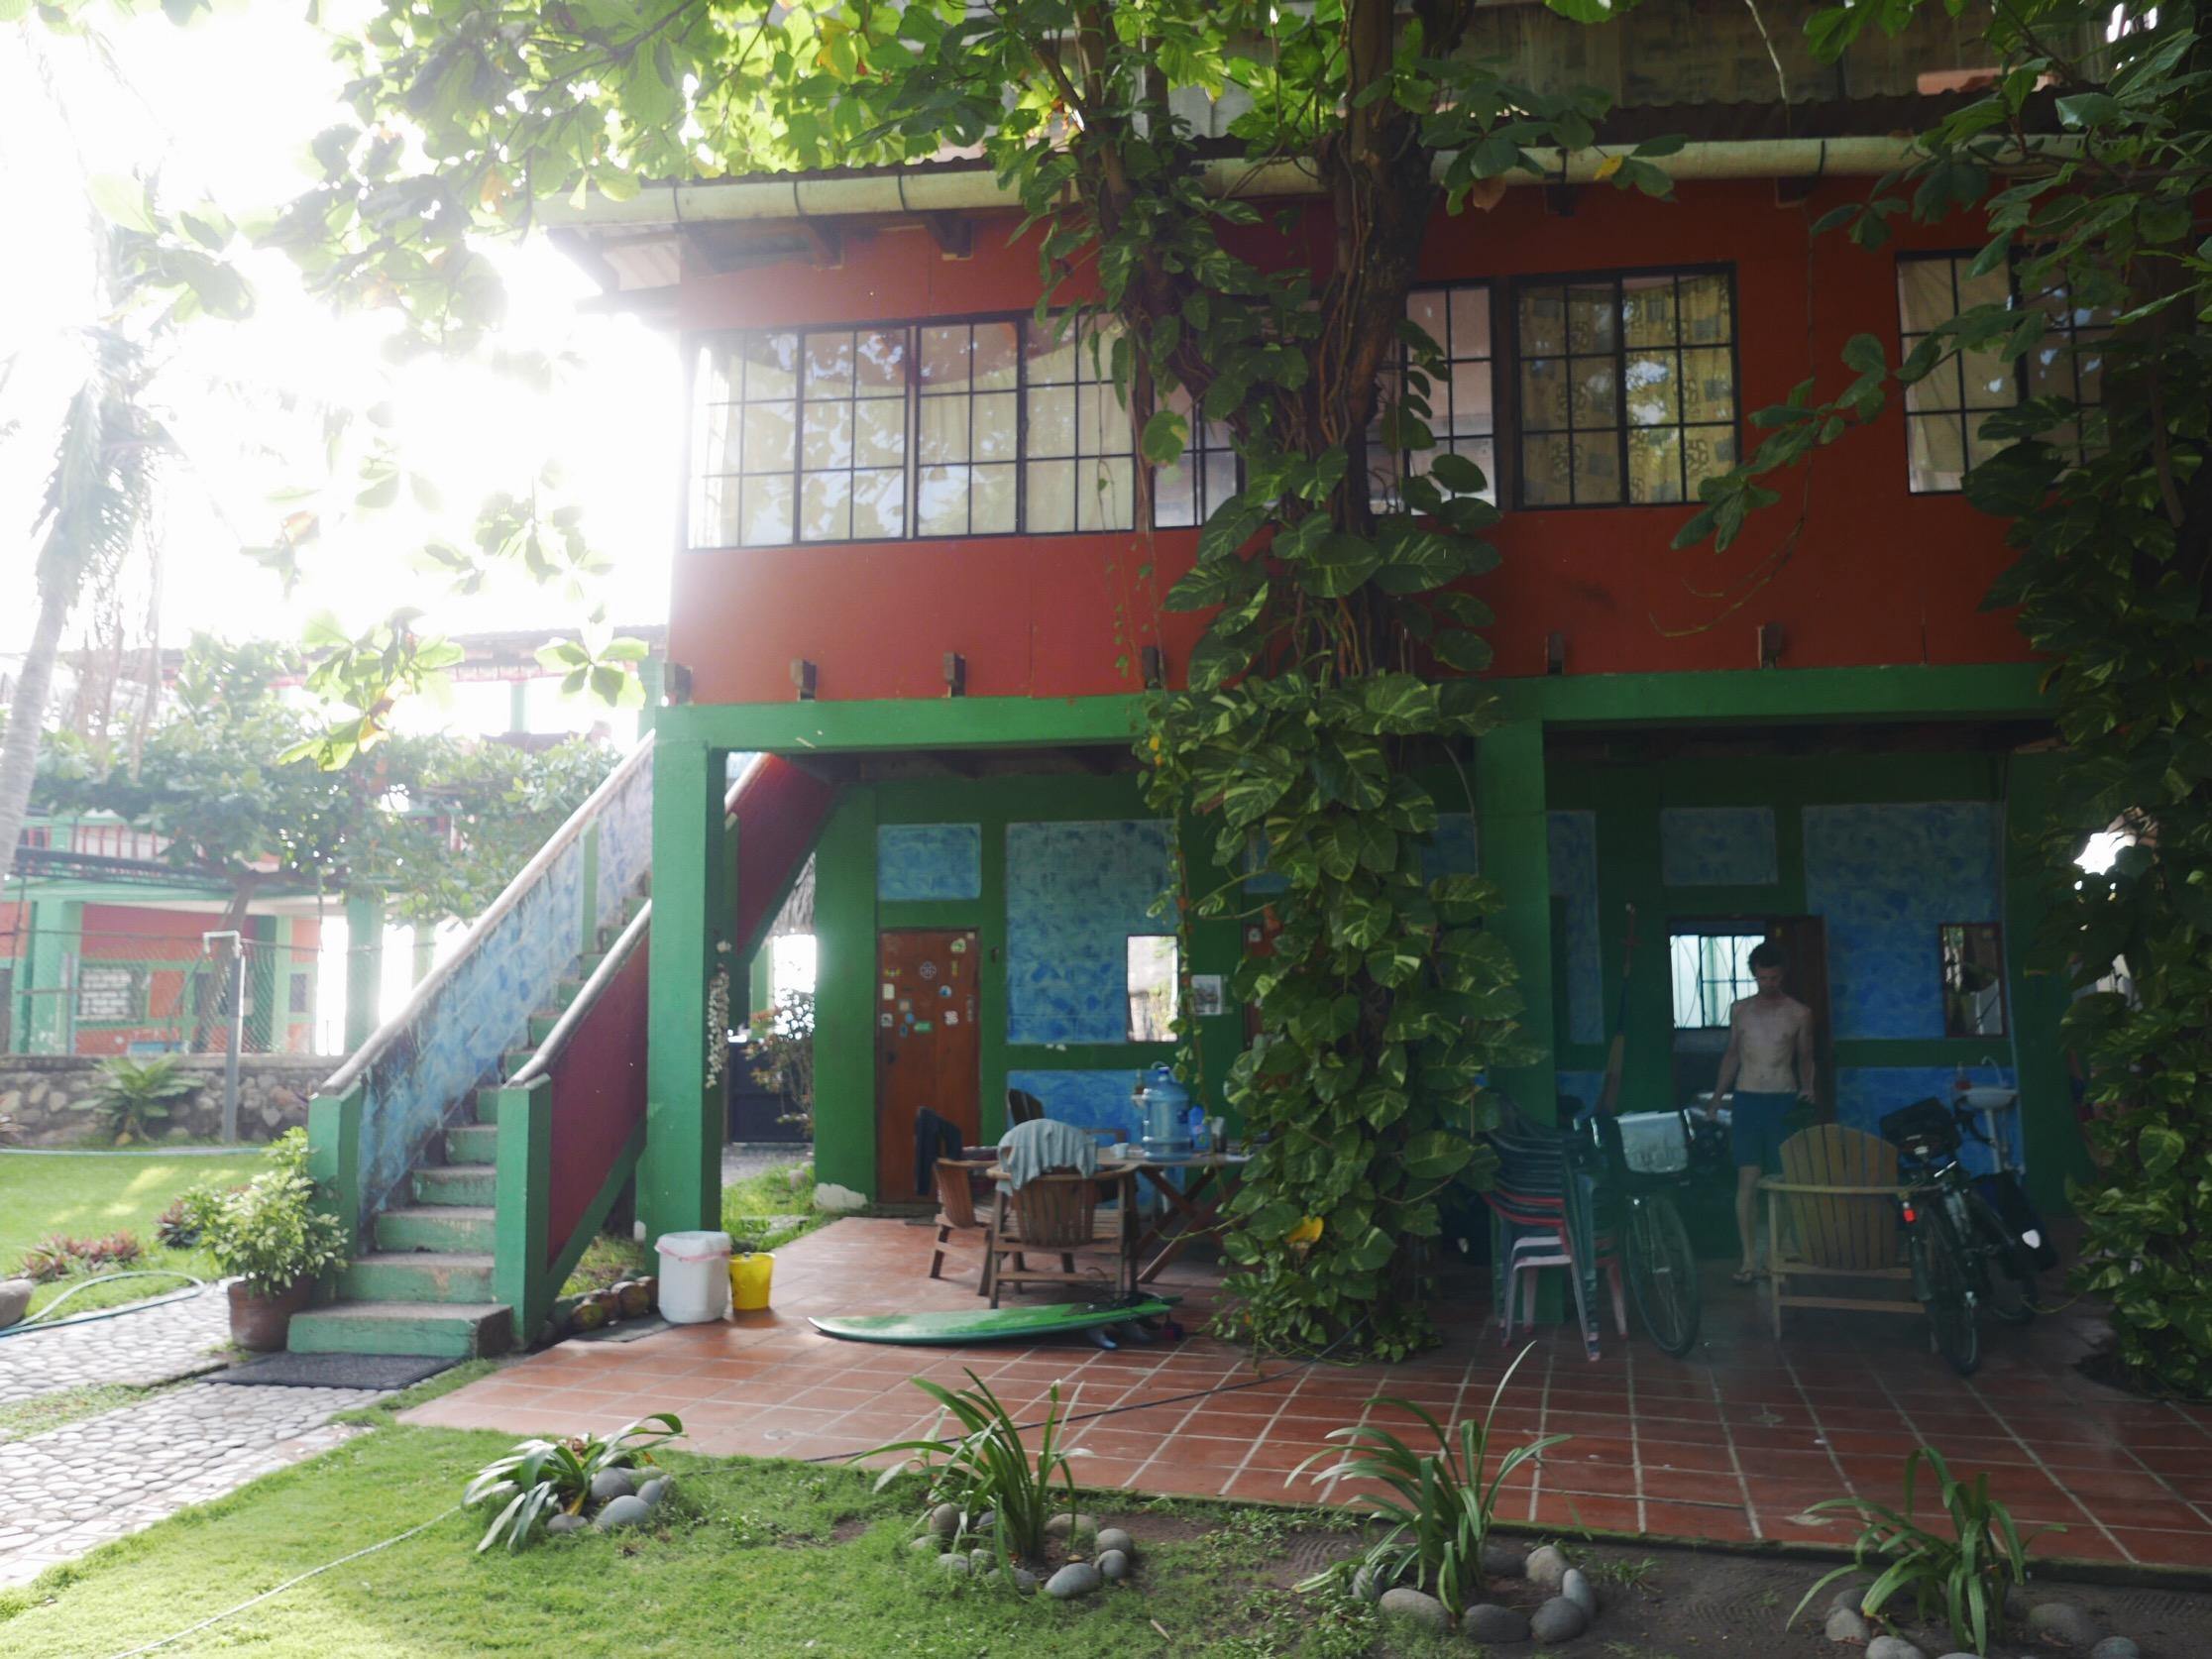 The host-ital. Recovery in the surf town, El Zonte, El Salvador.